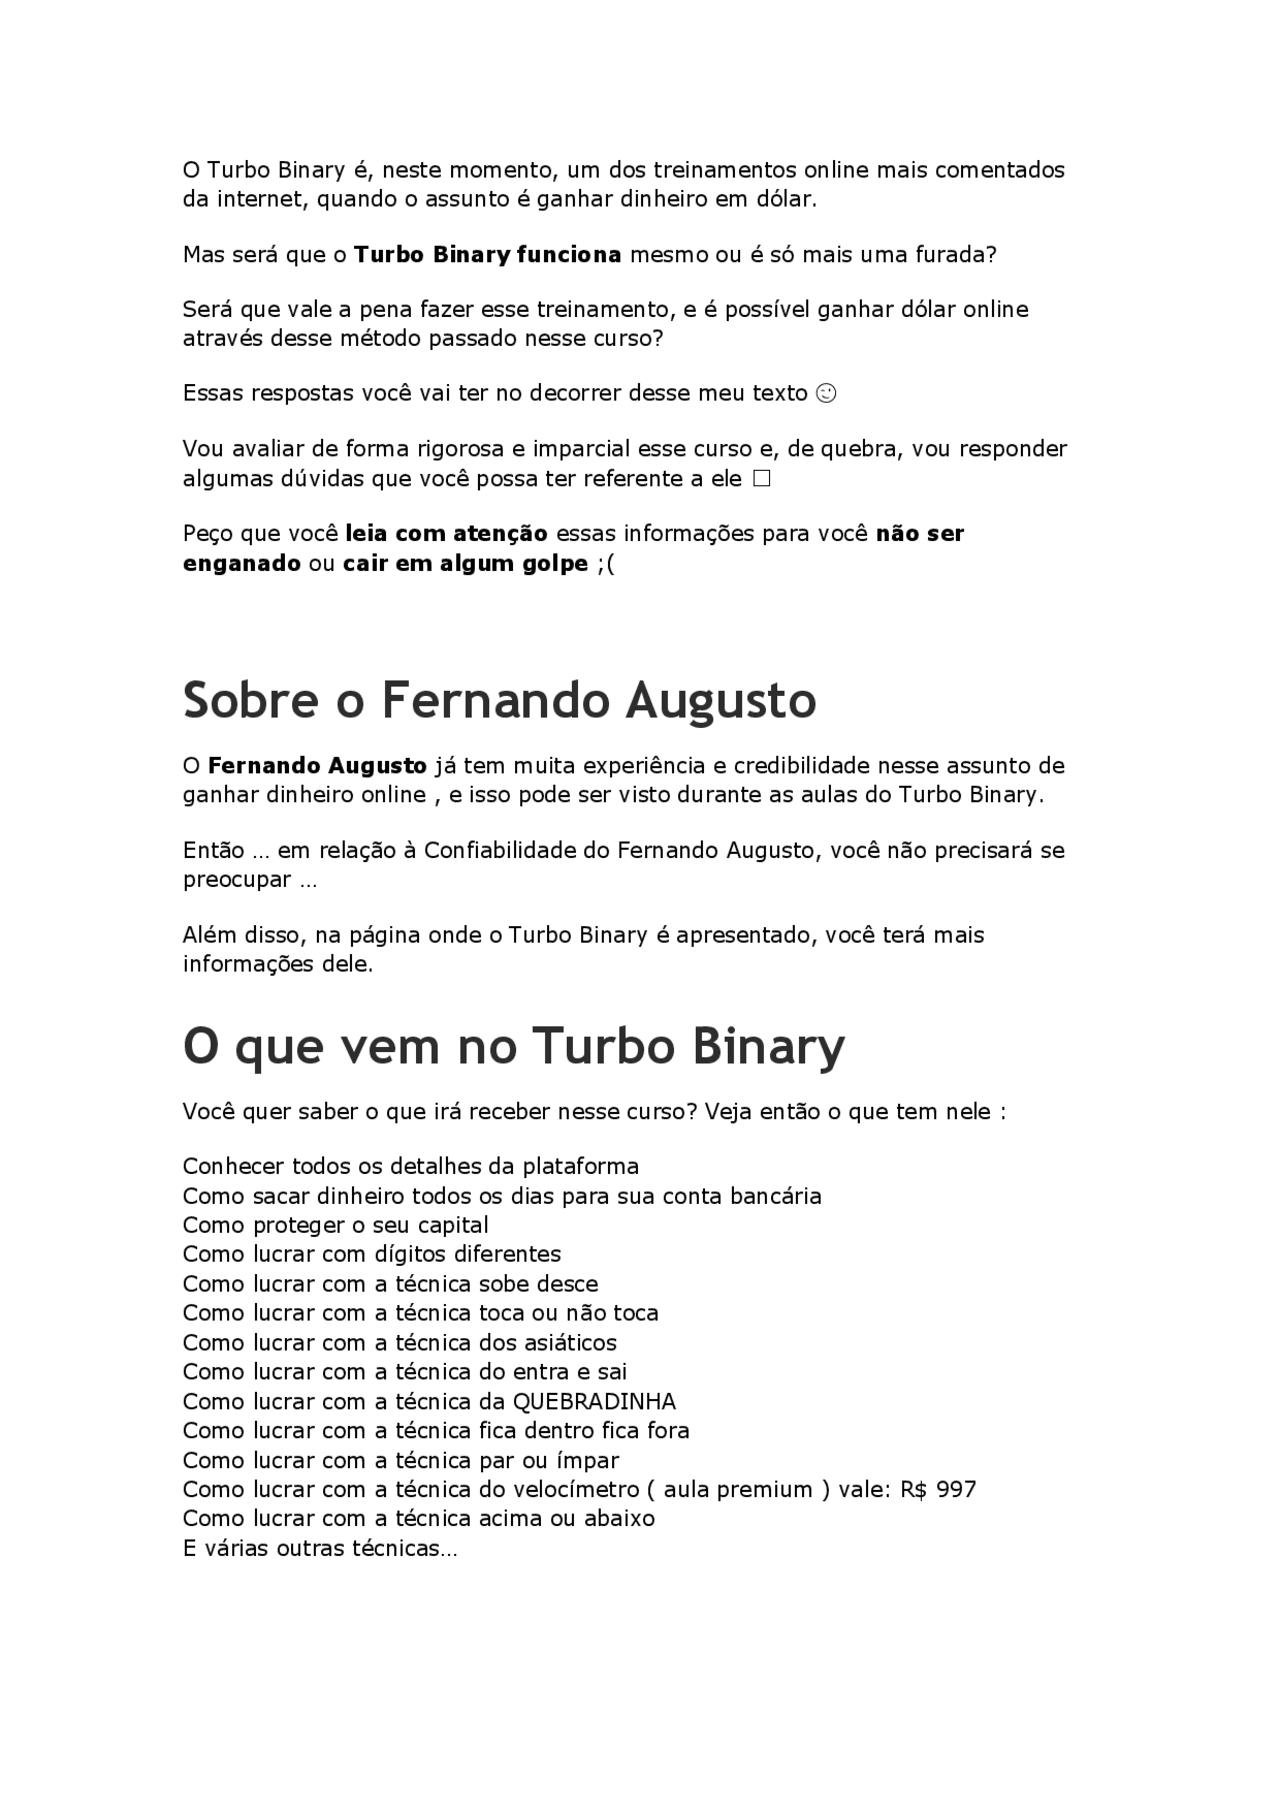 turbo binary reclame aqui